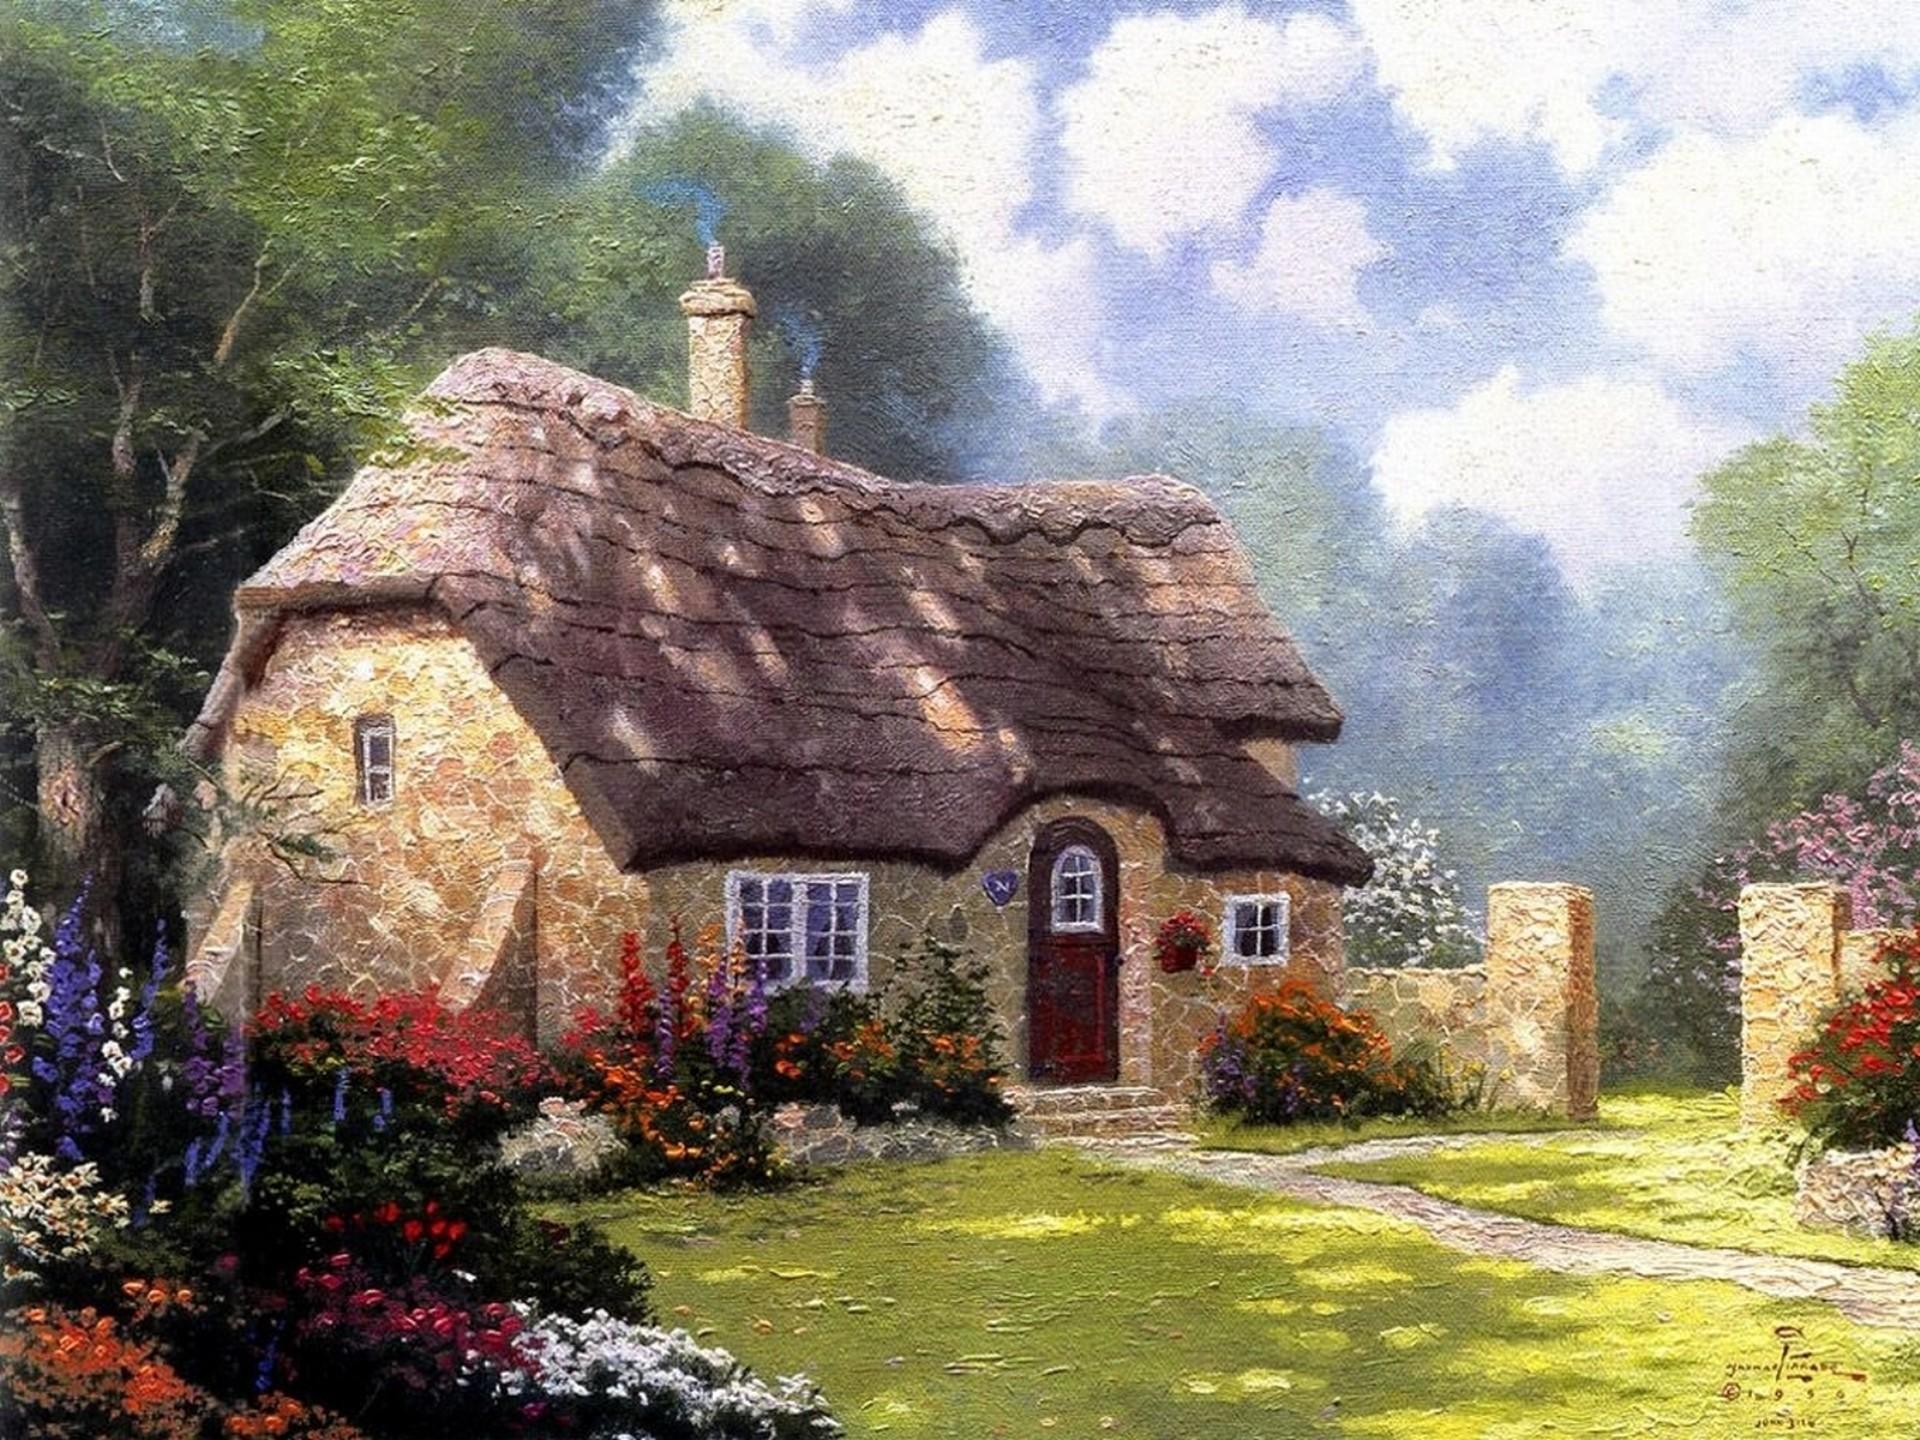 Thomas, Kinkade, Painting, Beautiful, Lodge, Roof, Hd, Wallpaper,